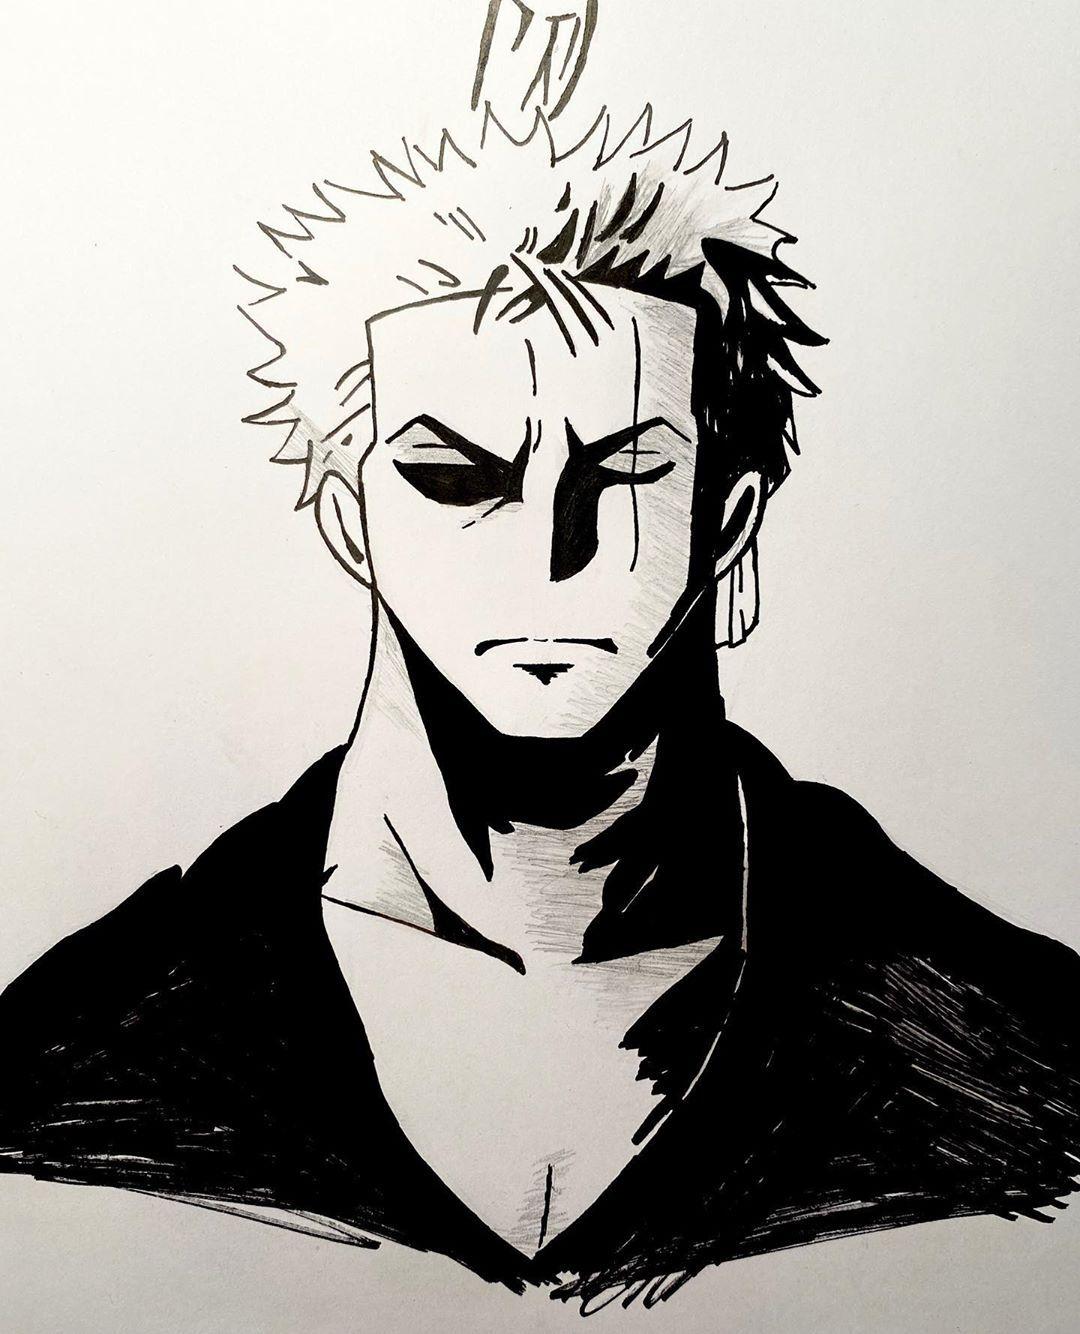 I haven't drawn zoro for my page yet crazy haha so I decided to his wano wanted poster your thoughts?? #onepiece #zoro #zorororonoa #luffy #luffyonepiece #nami #sanji #goku #art #artistsoninstagram #artist #drawing #ink #blackandwhite #manga #mangaart #anime #animeart #artoftheday #naruto #pen